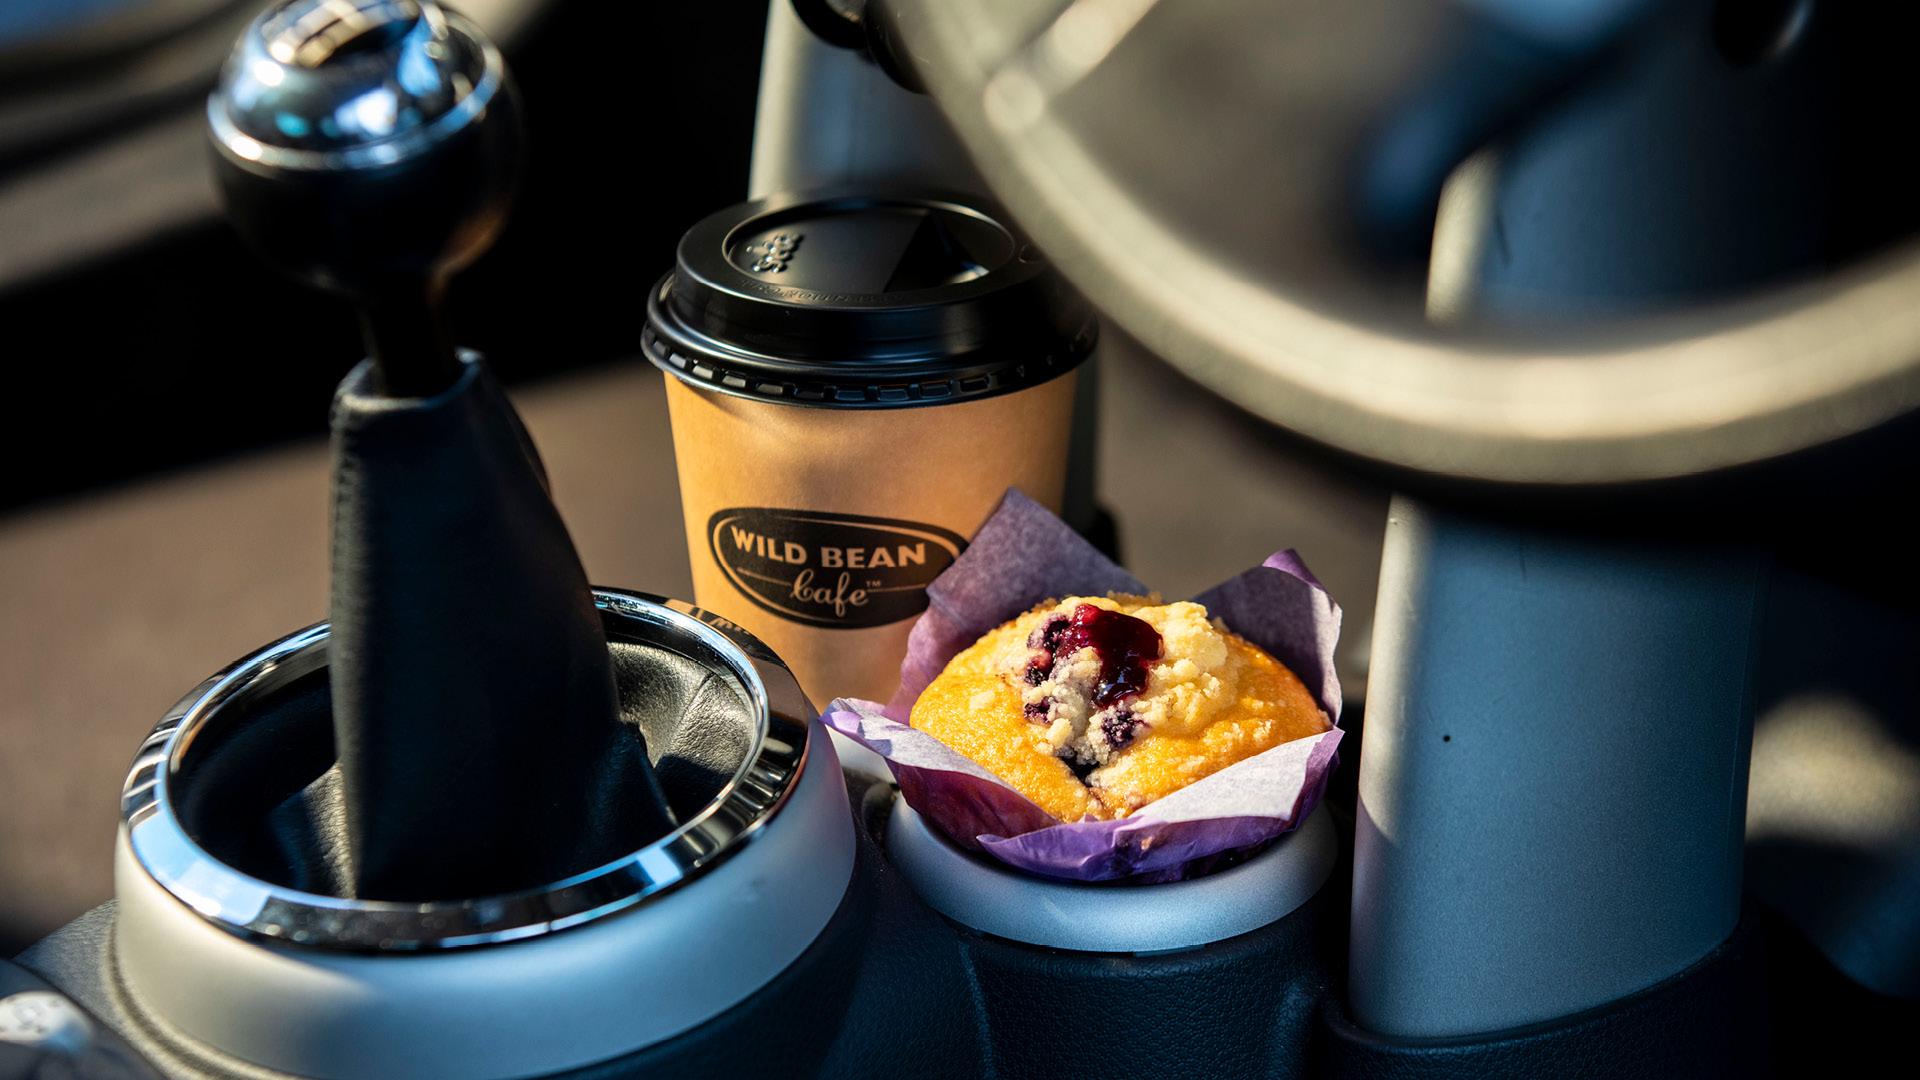 Wild Bean Cafe Newmarket 01638 576072